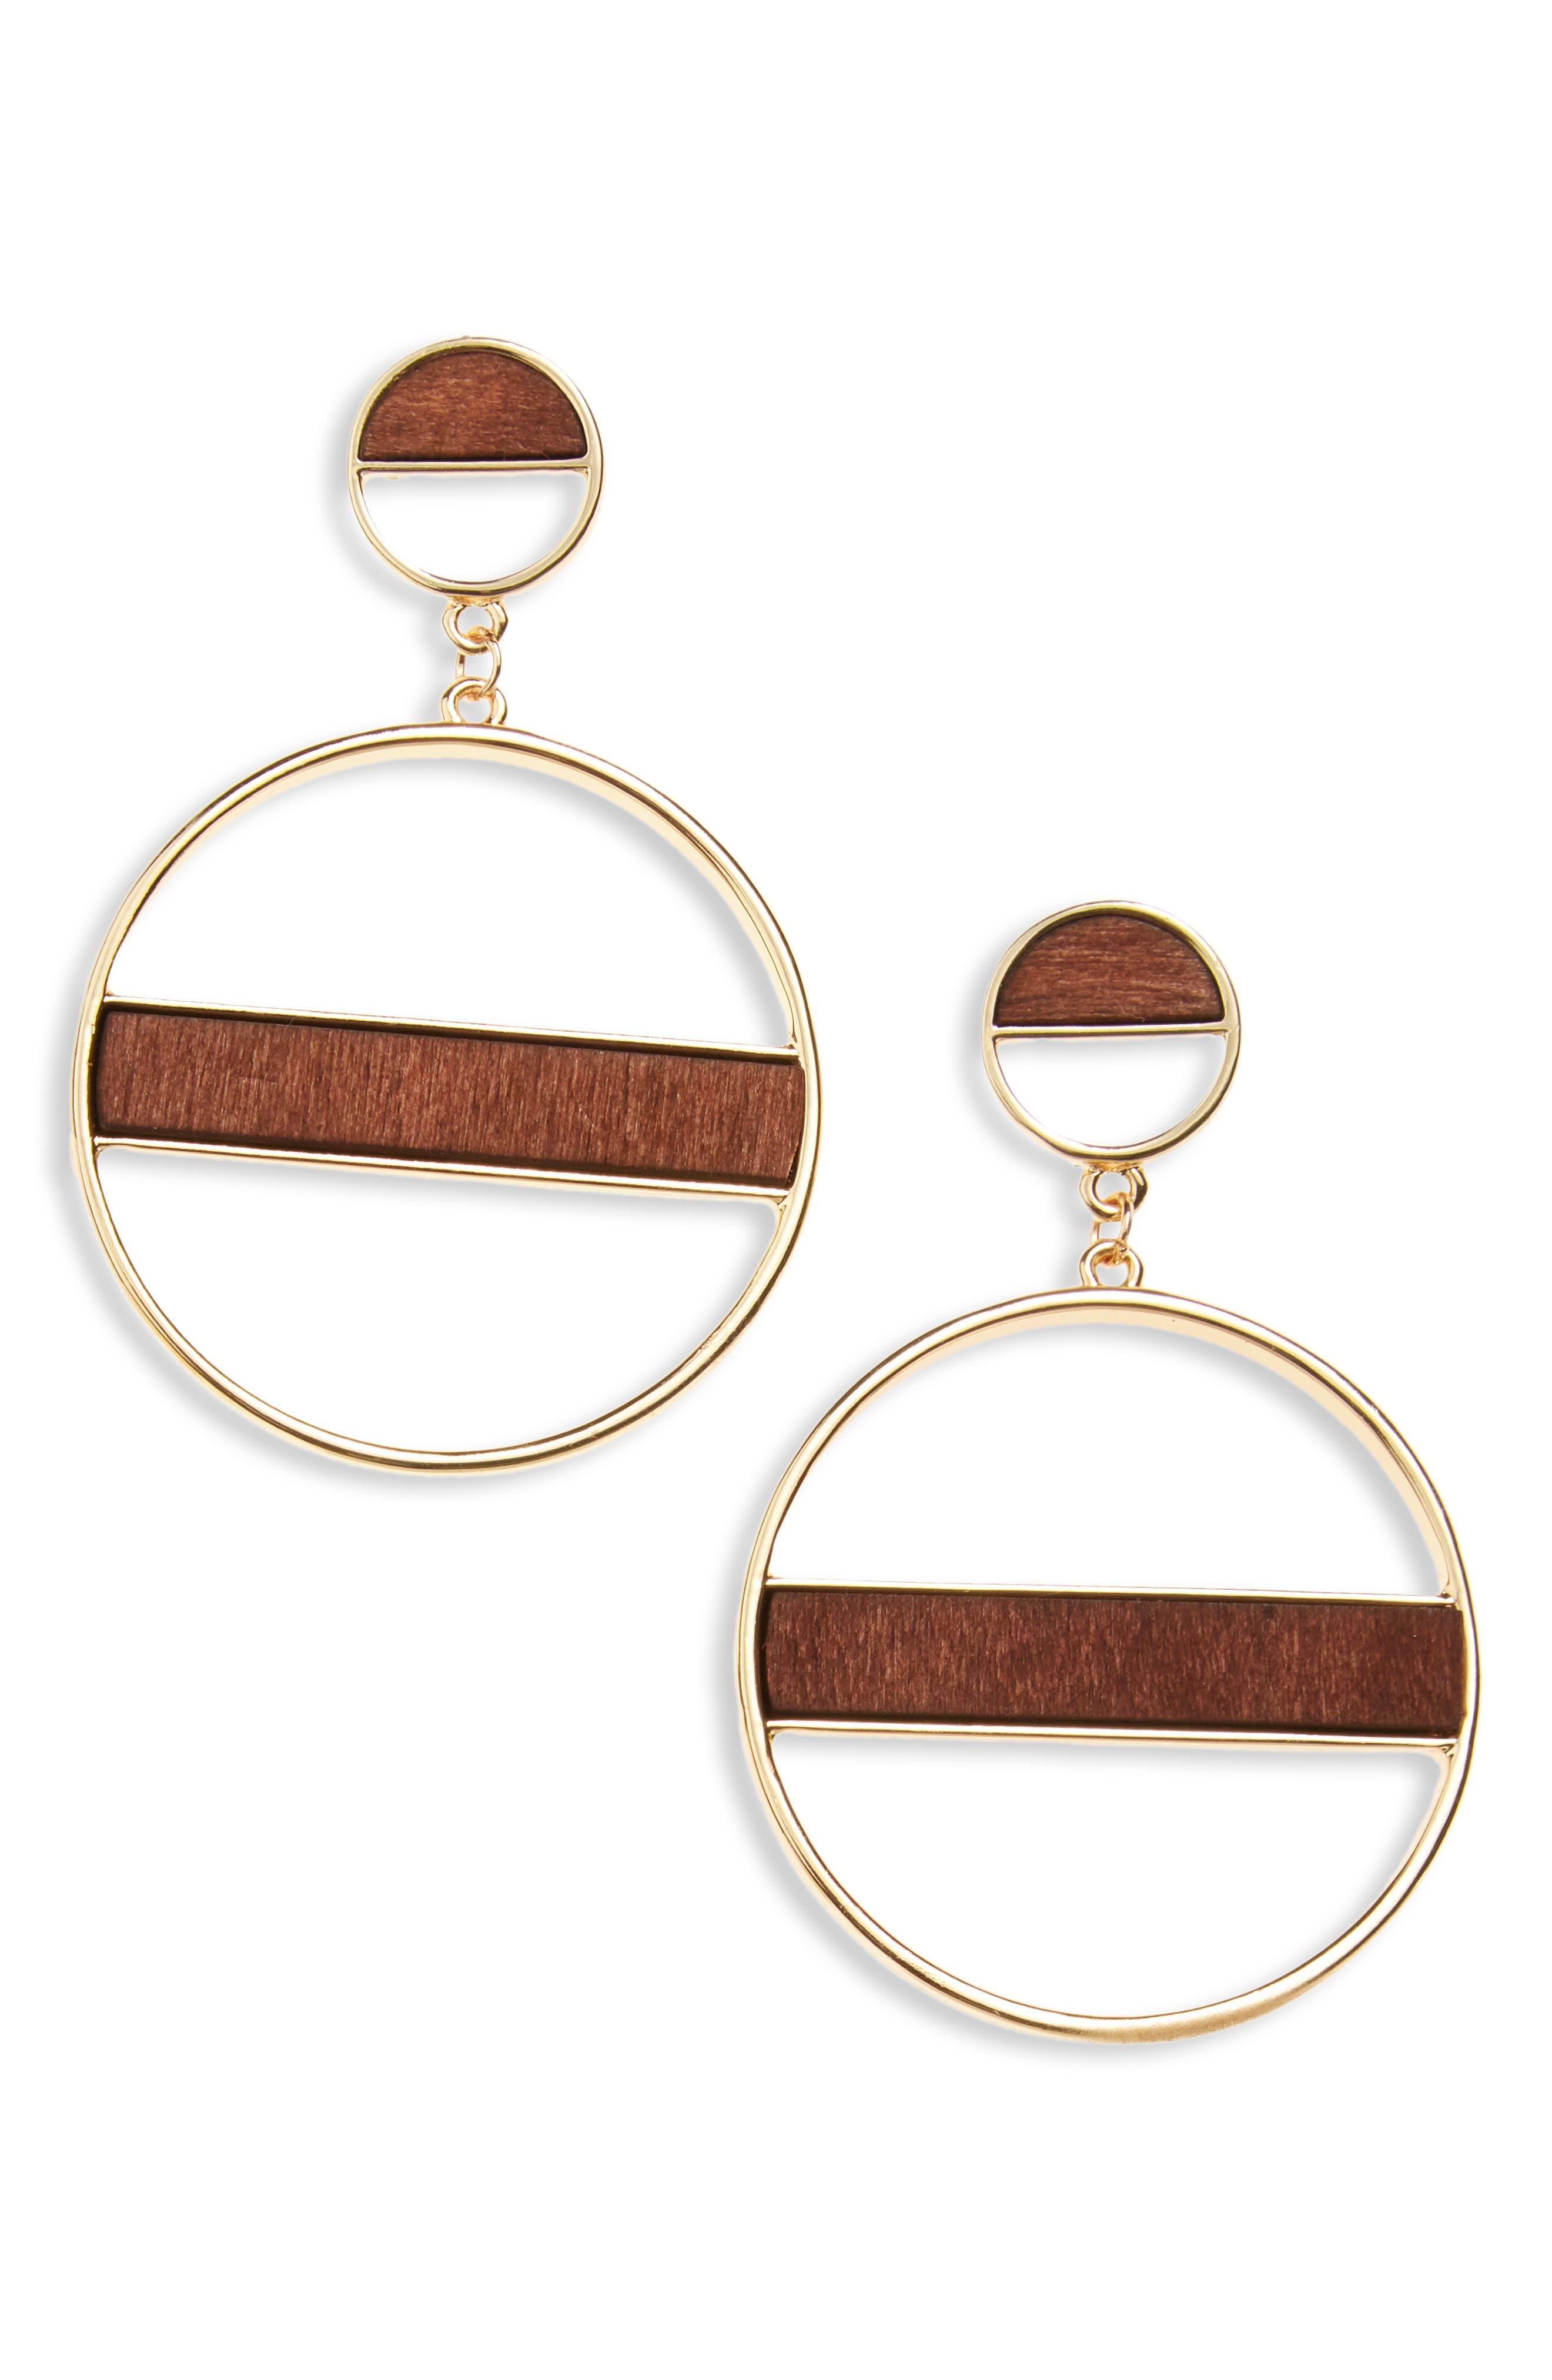 Wood Detail Hoop Earrings,                             Main thumbnail 1, color,                             Gold/ Wood